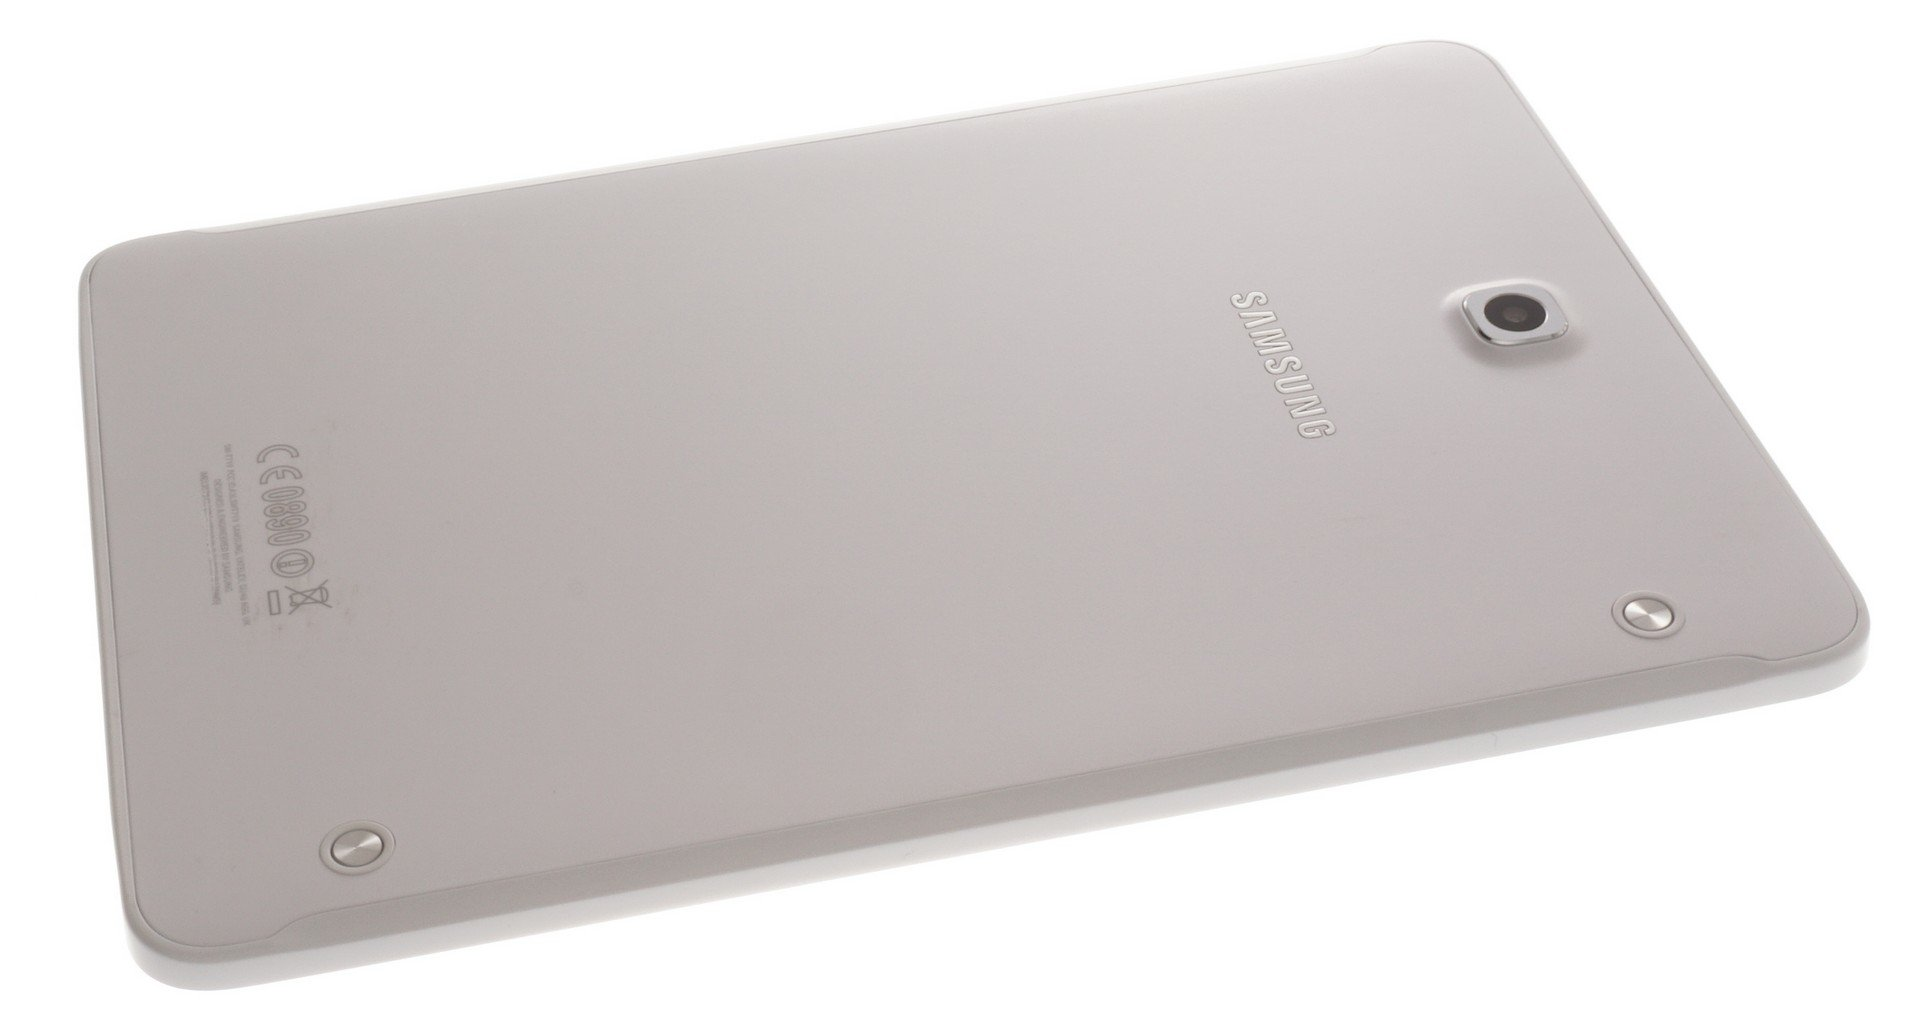 tablet samsung galaxy tab s2 8 0 lte 23 telefony. Black Bedroom Furniture Sets. Home Design Ideas